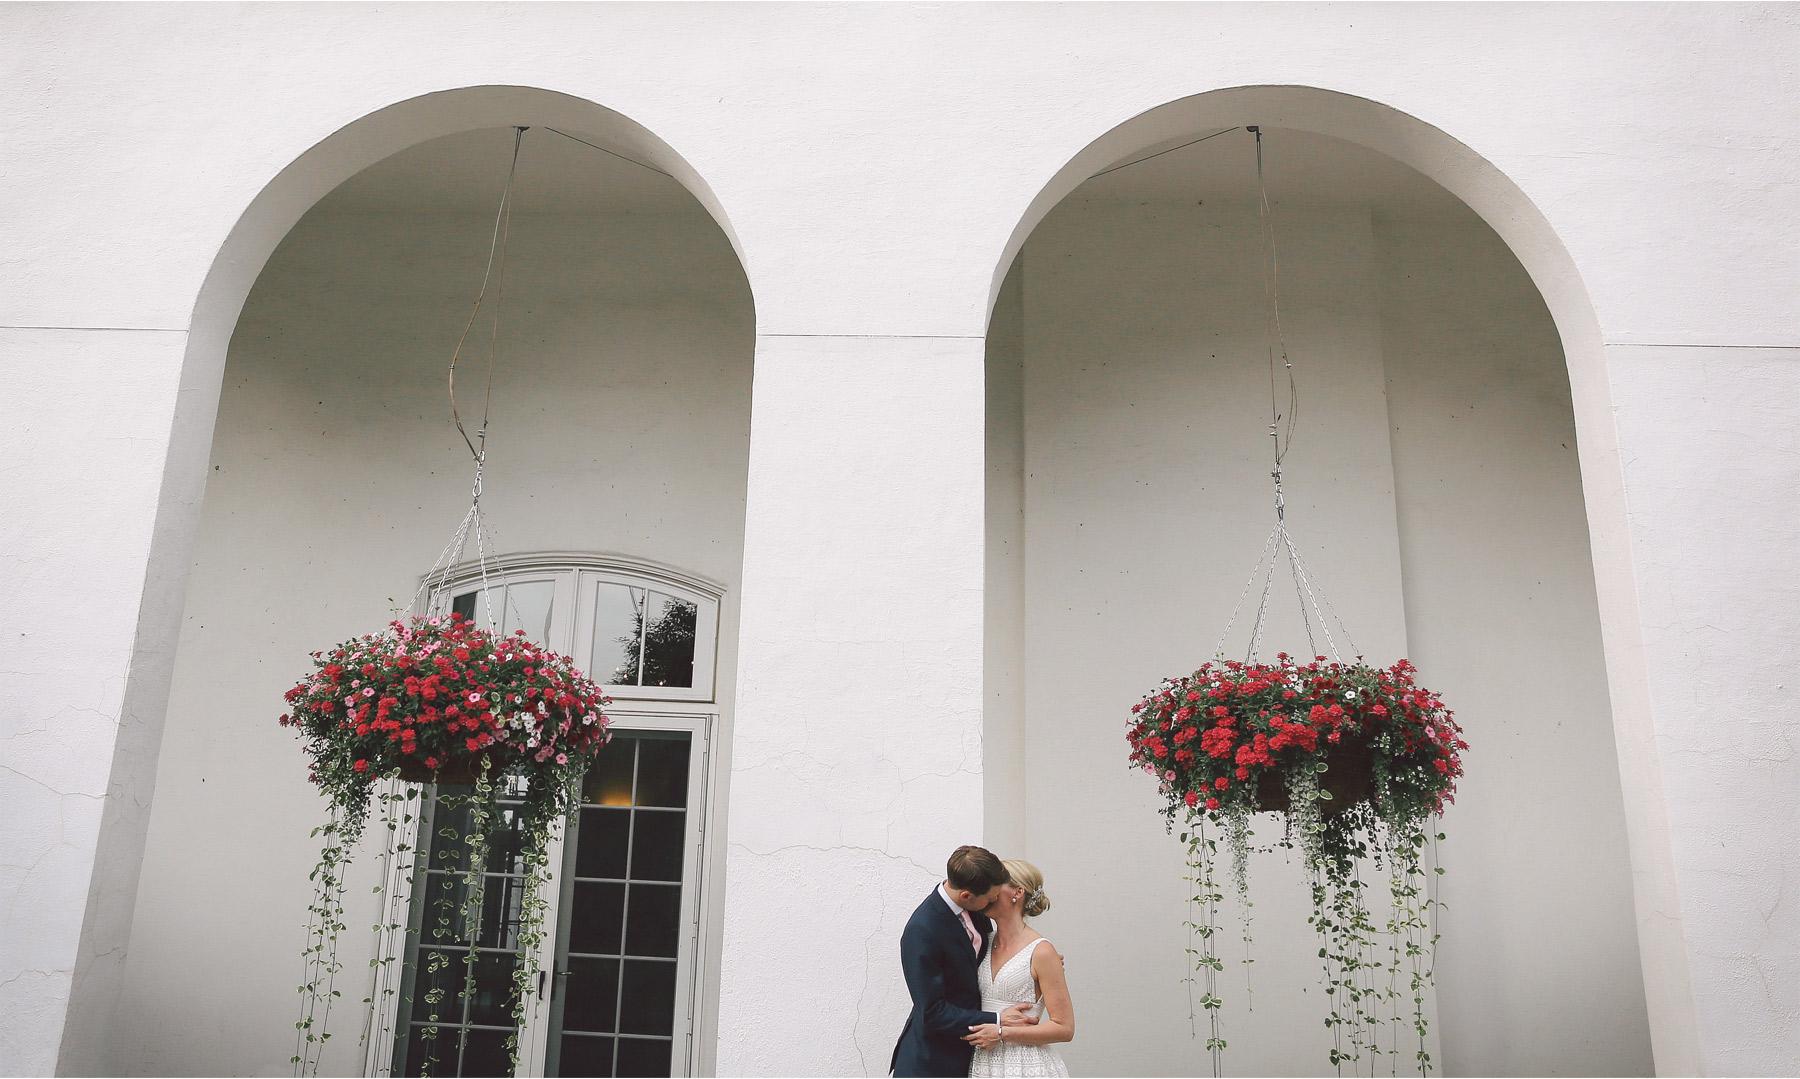 15-Minneapolis-Minnesota-Wedding-Photography-by-Vick-Photography-Lafayette-Club-Maggie-and-Nicholas.jpg